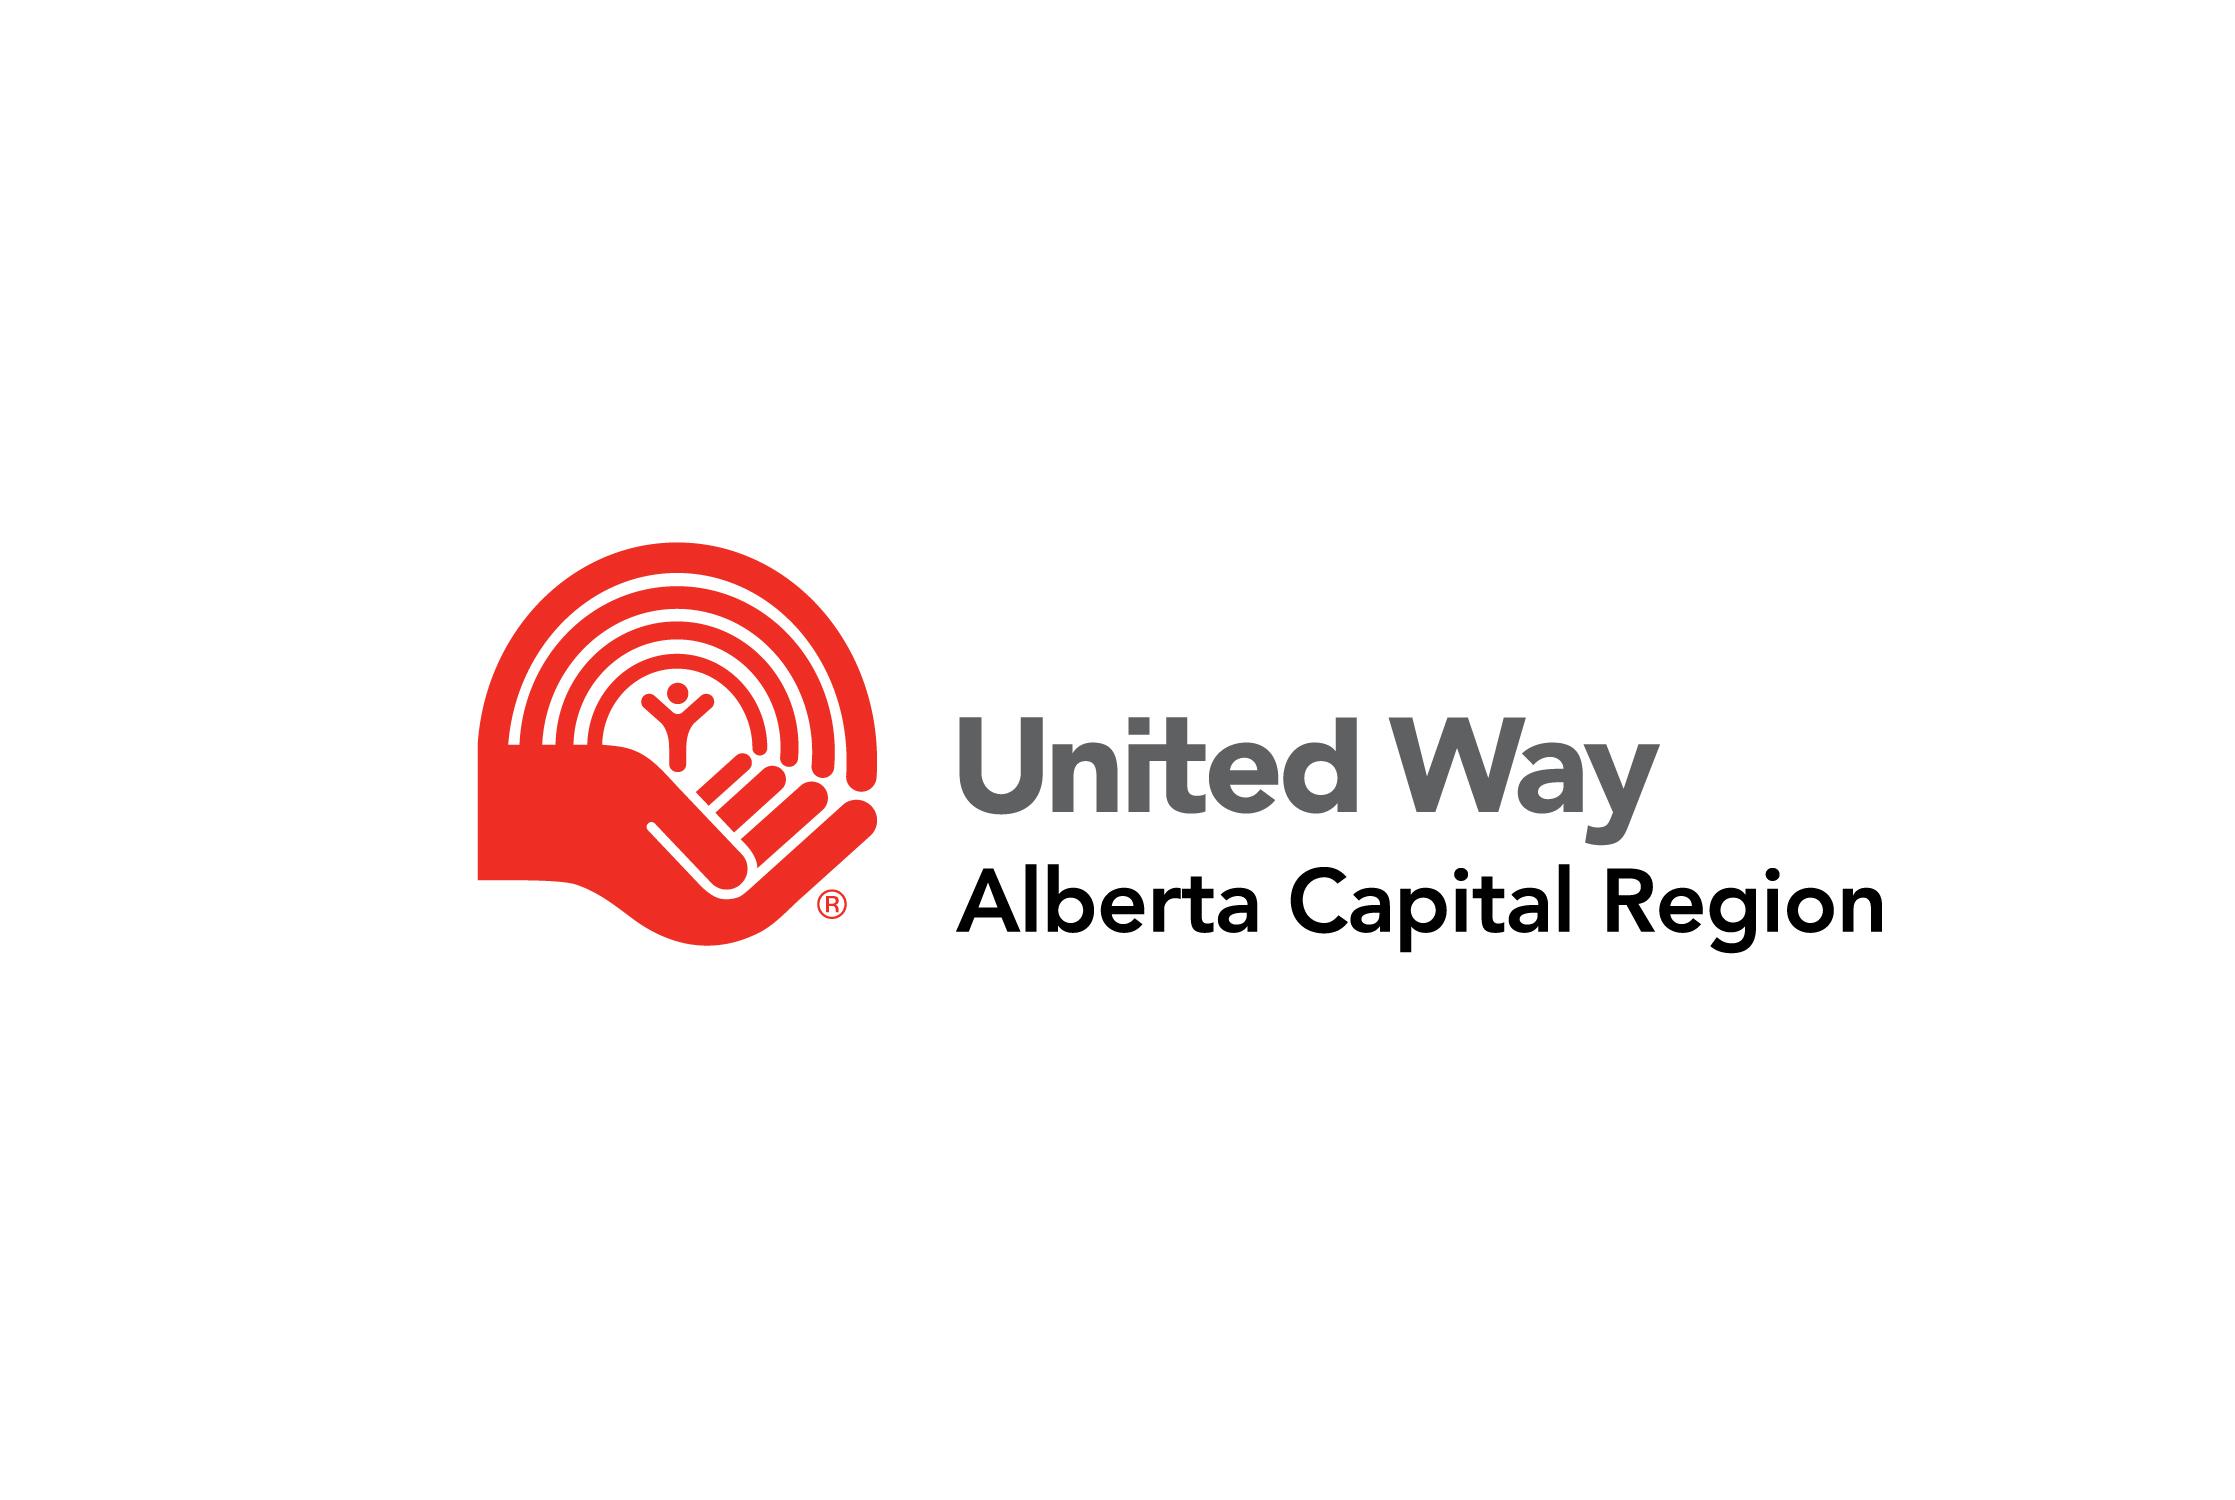 united way of the alberta capital region logo.jpg